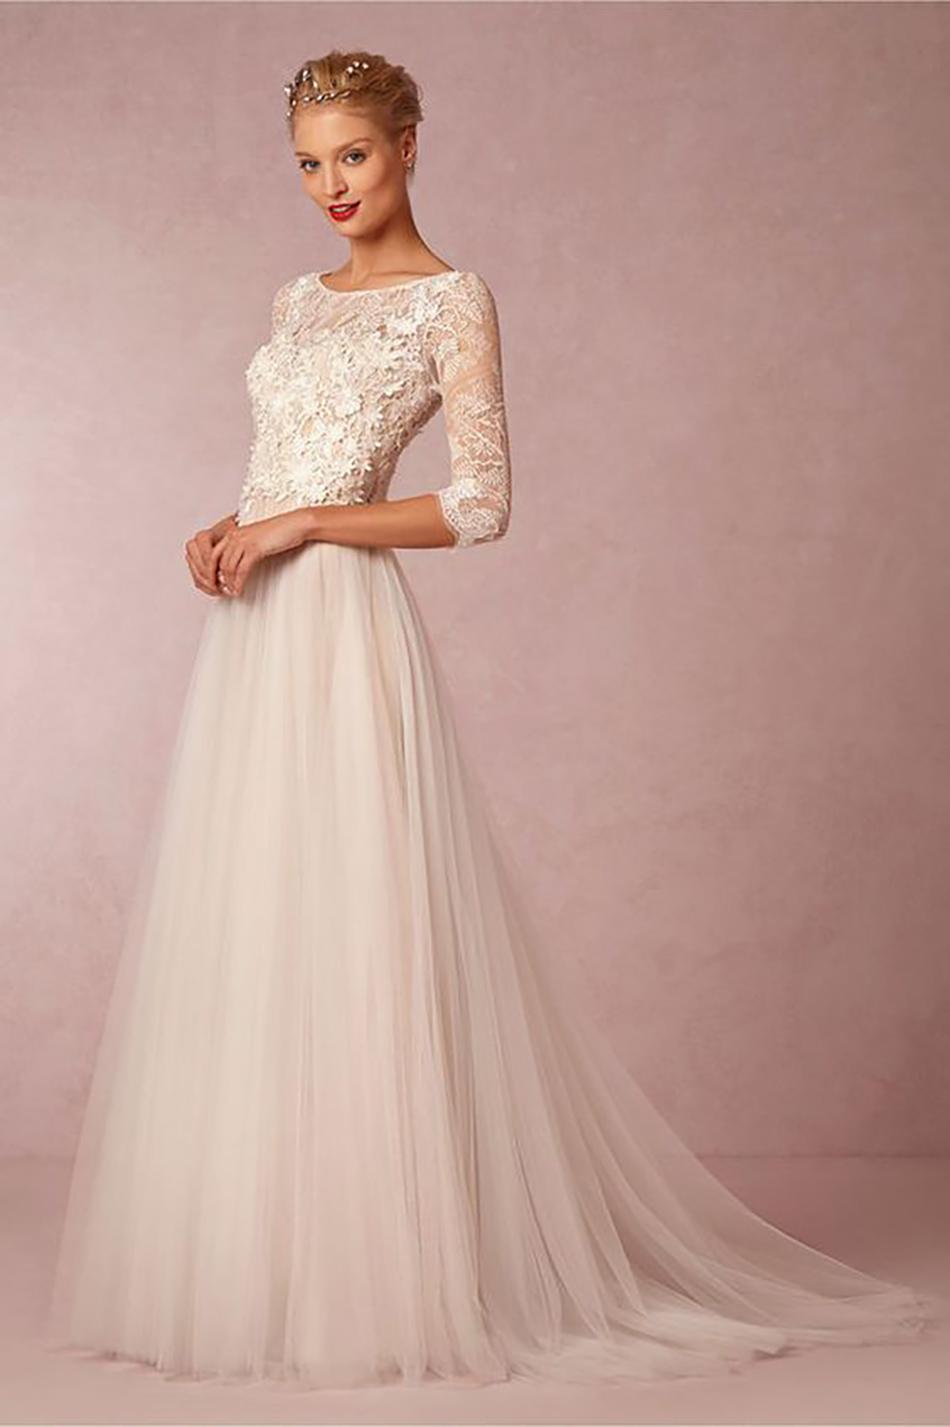 One wedding dress? Try three!